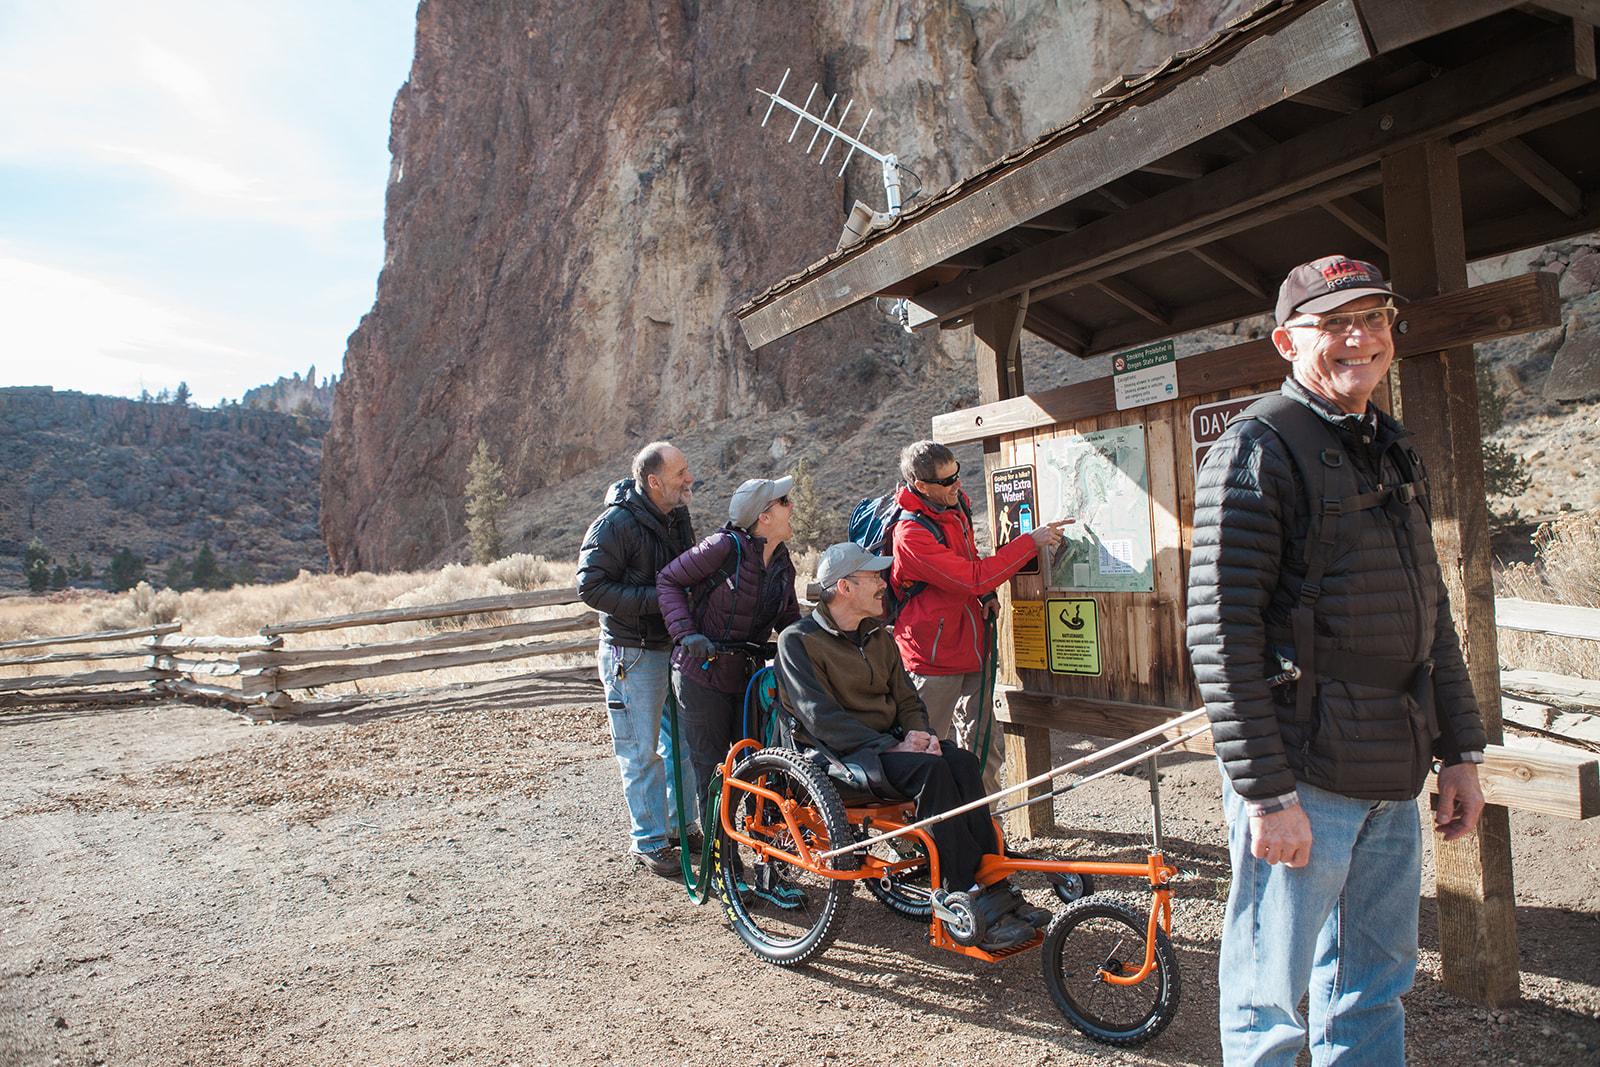 AdvenChair-offroad-wheelchair-Bend-Oregon-111.jpg